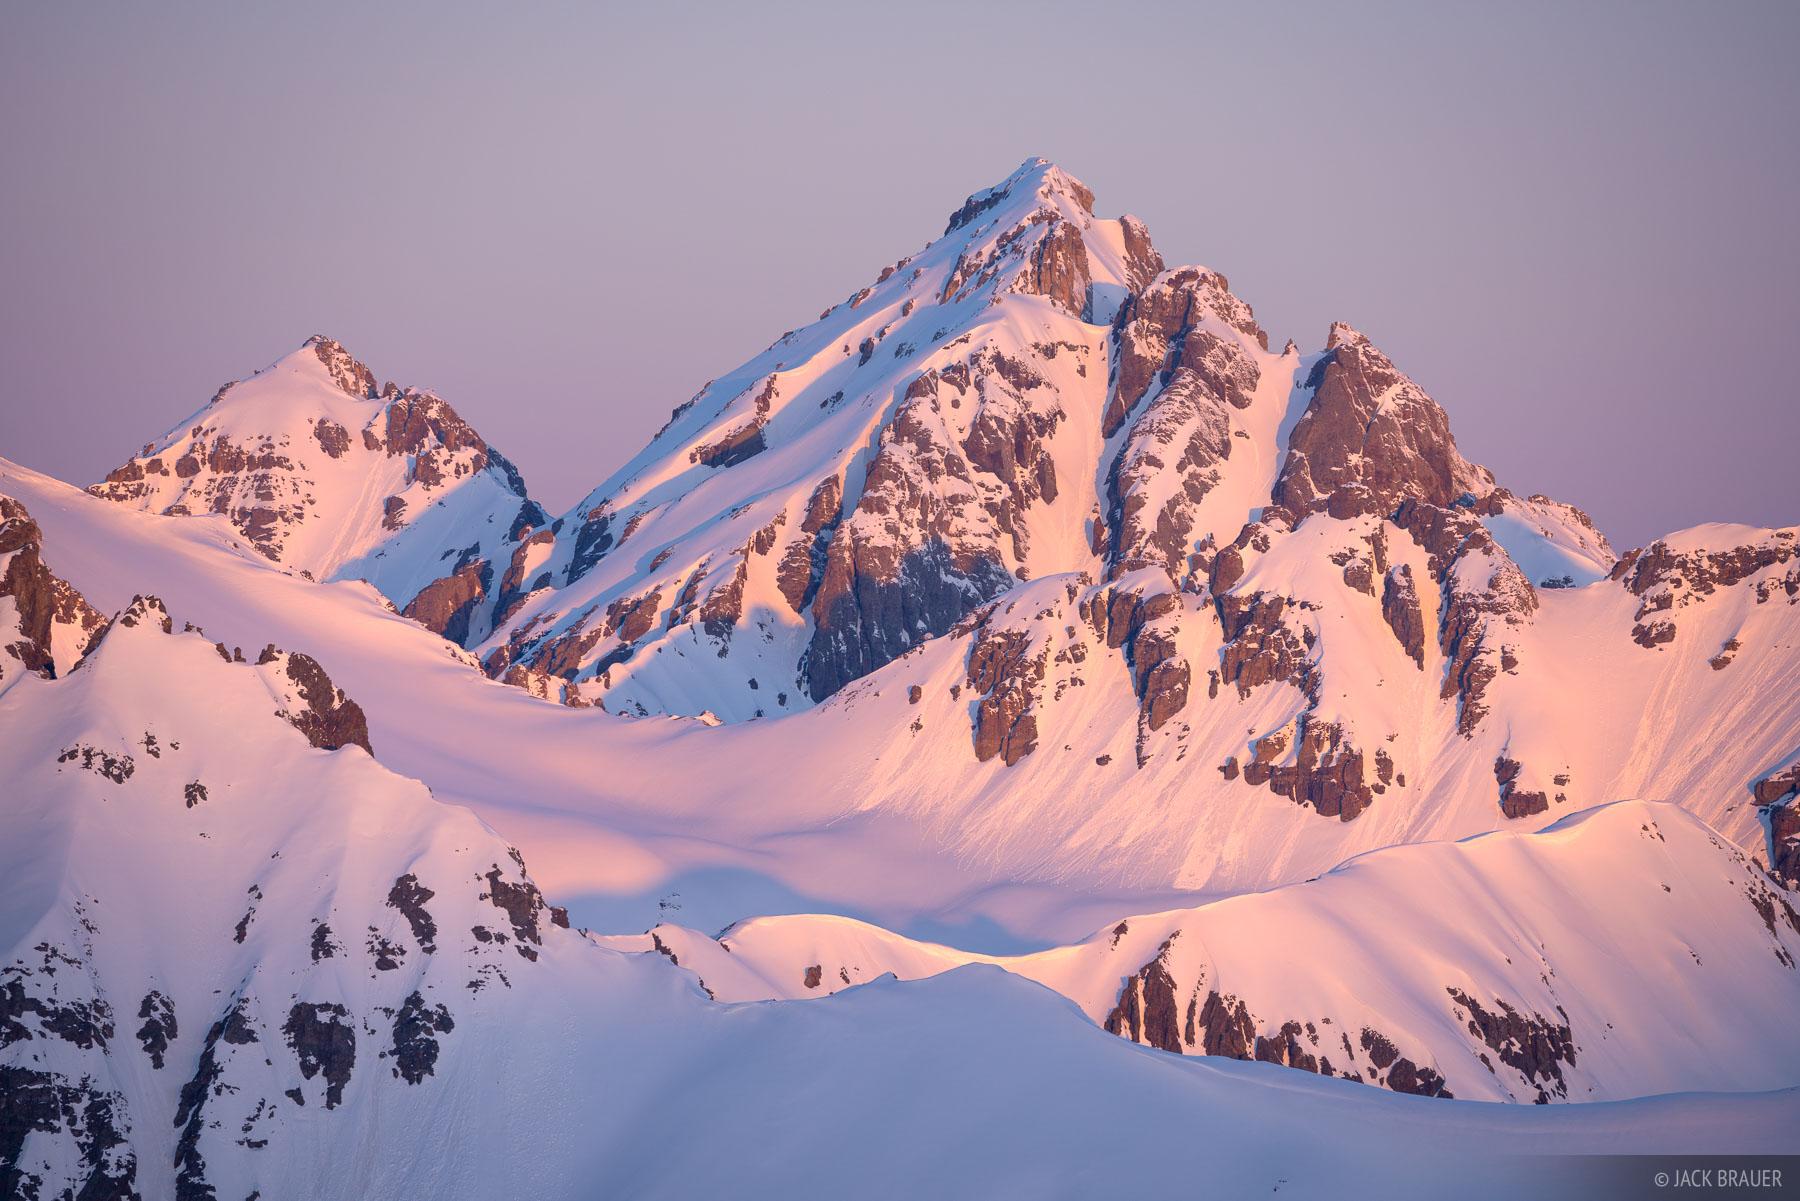 Colorado, San Juan Mountains, Ulysses S Grant Peak, sunrise, photo